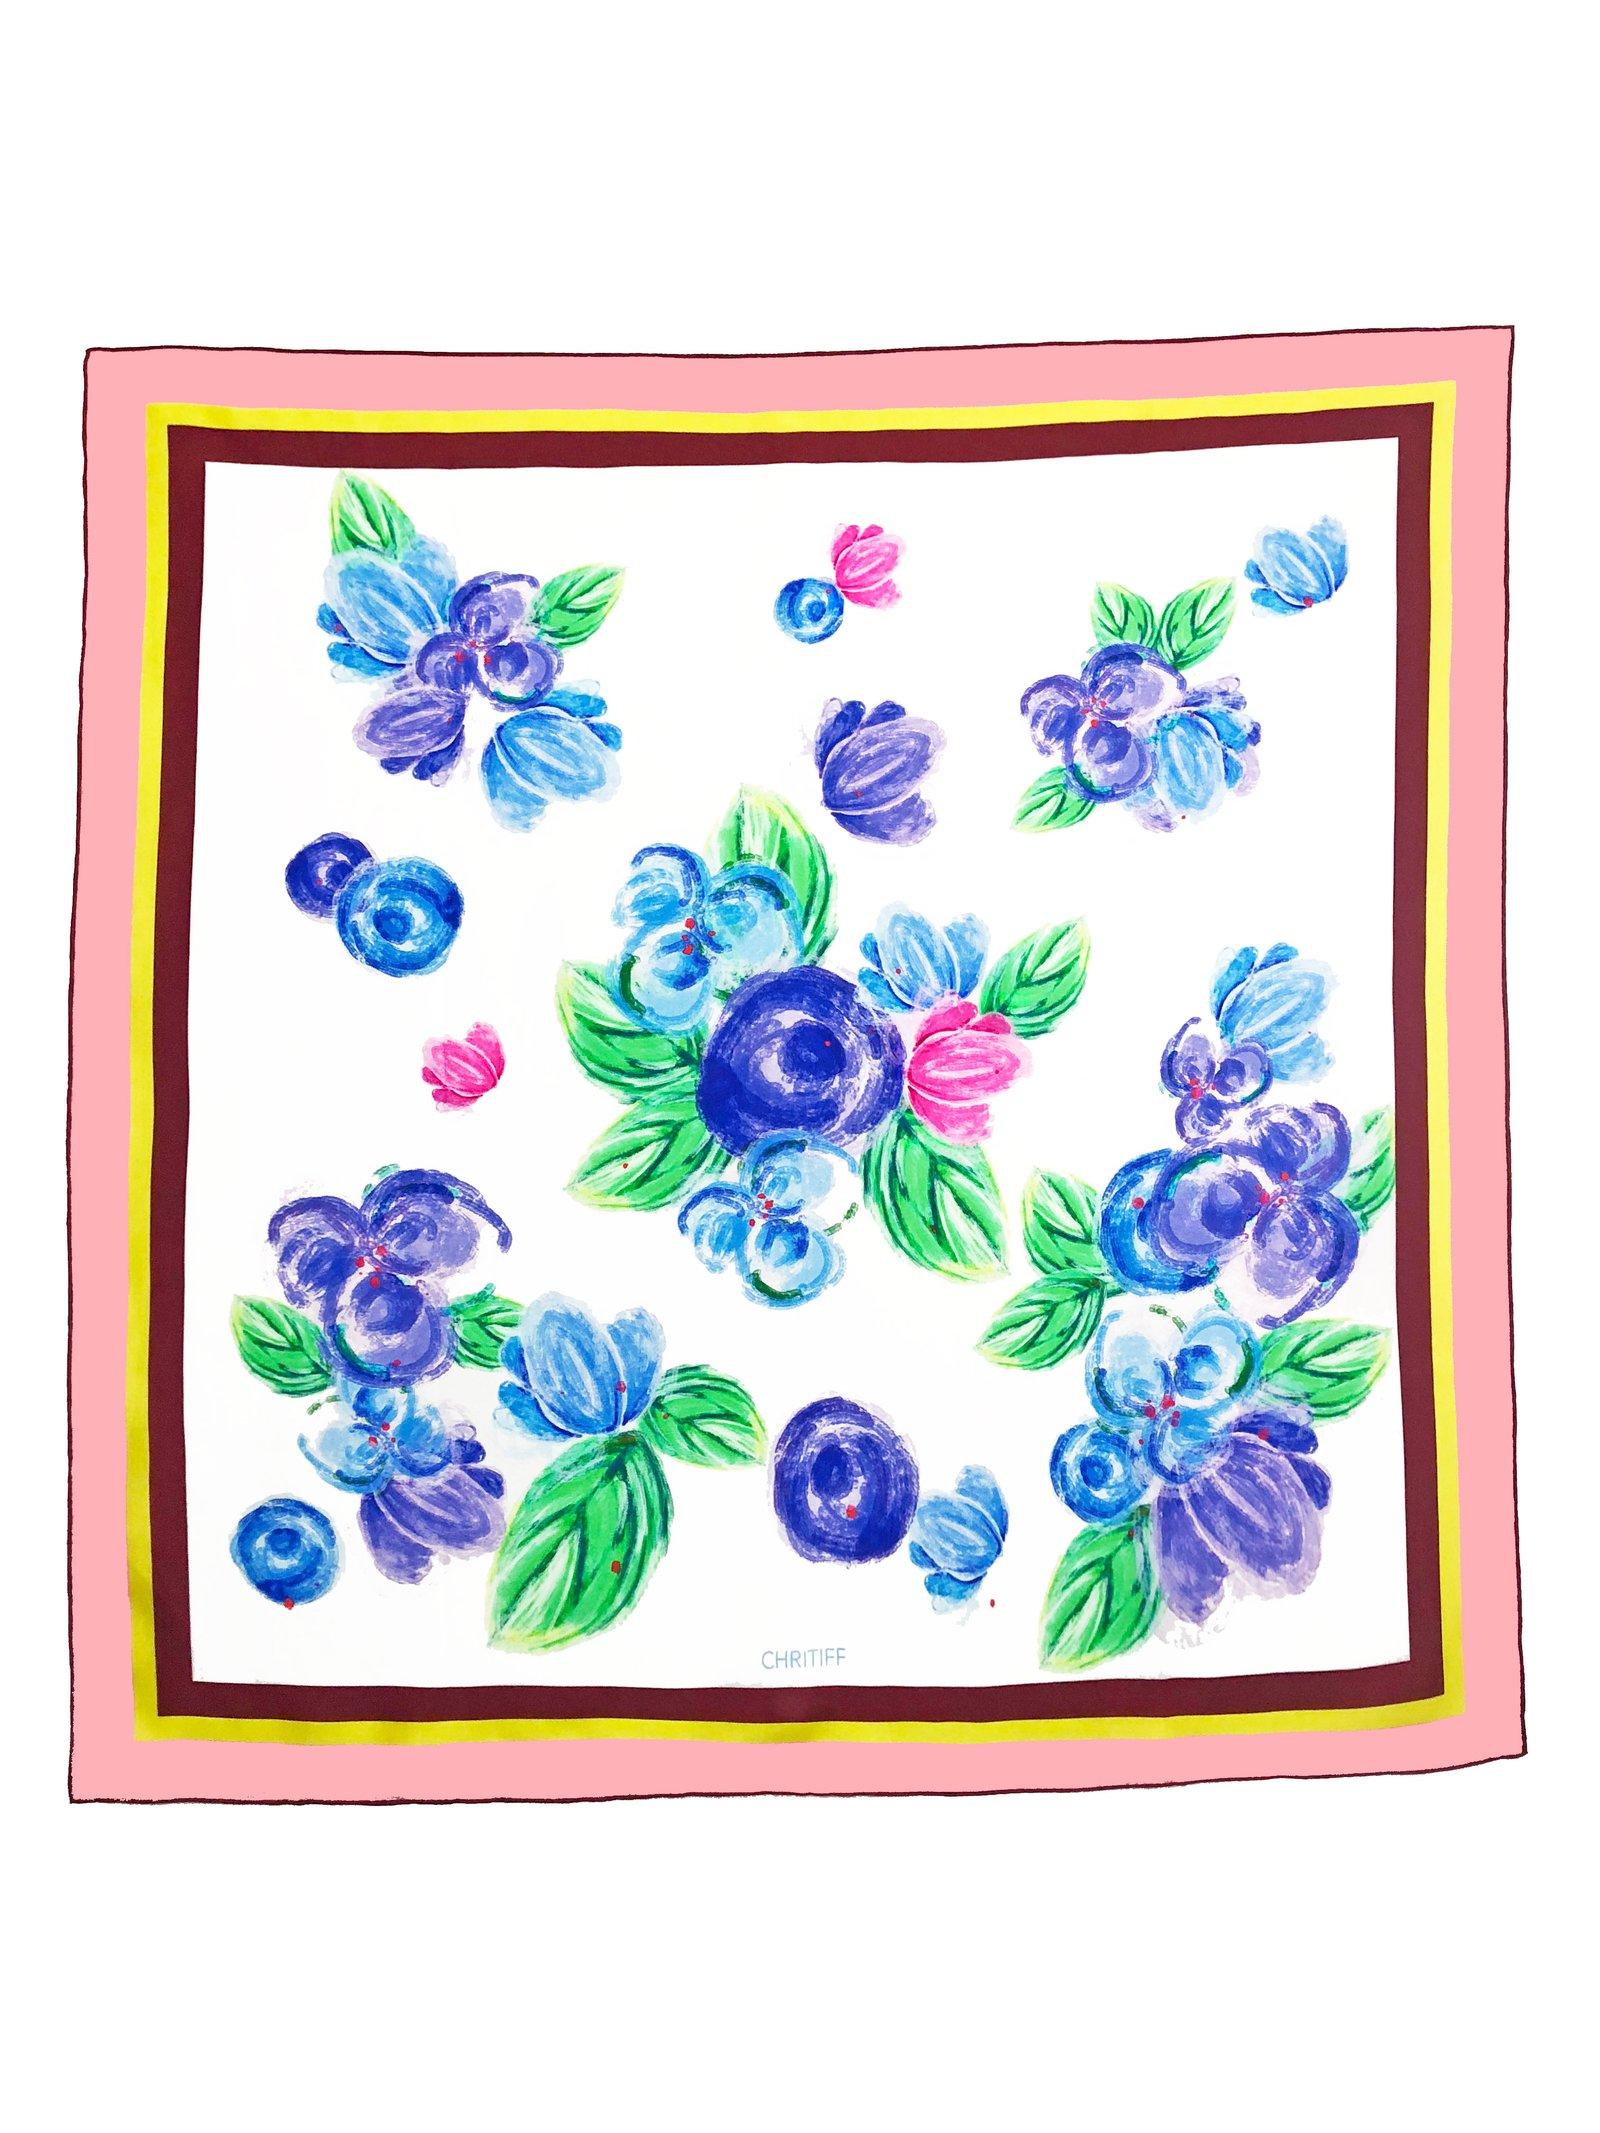 CHRITIFF Cherry Blossom Scarf (Azure Blue) 90cm